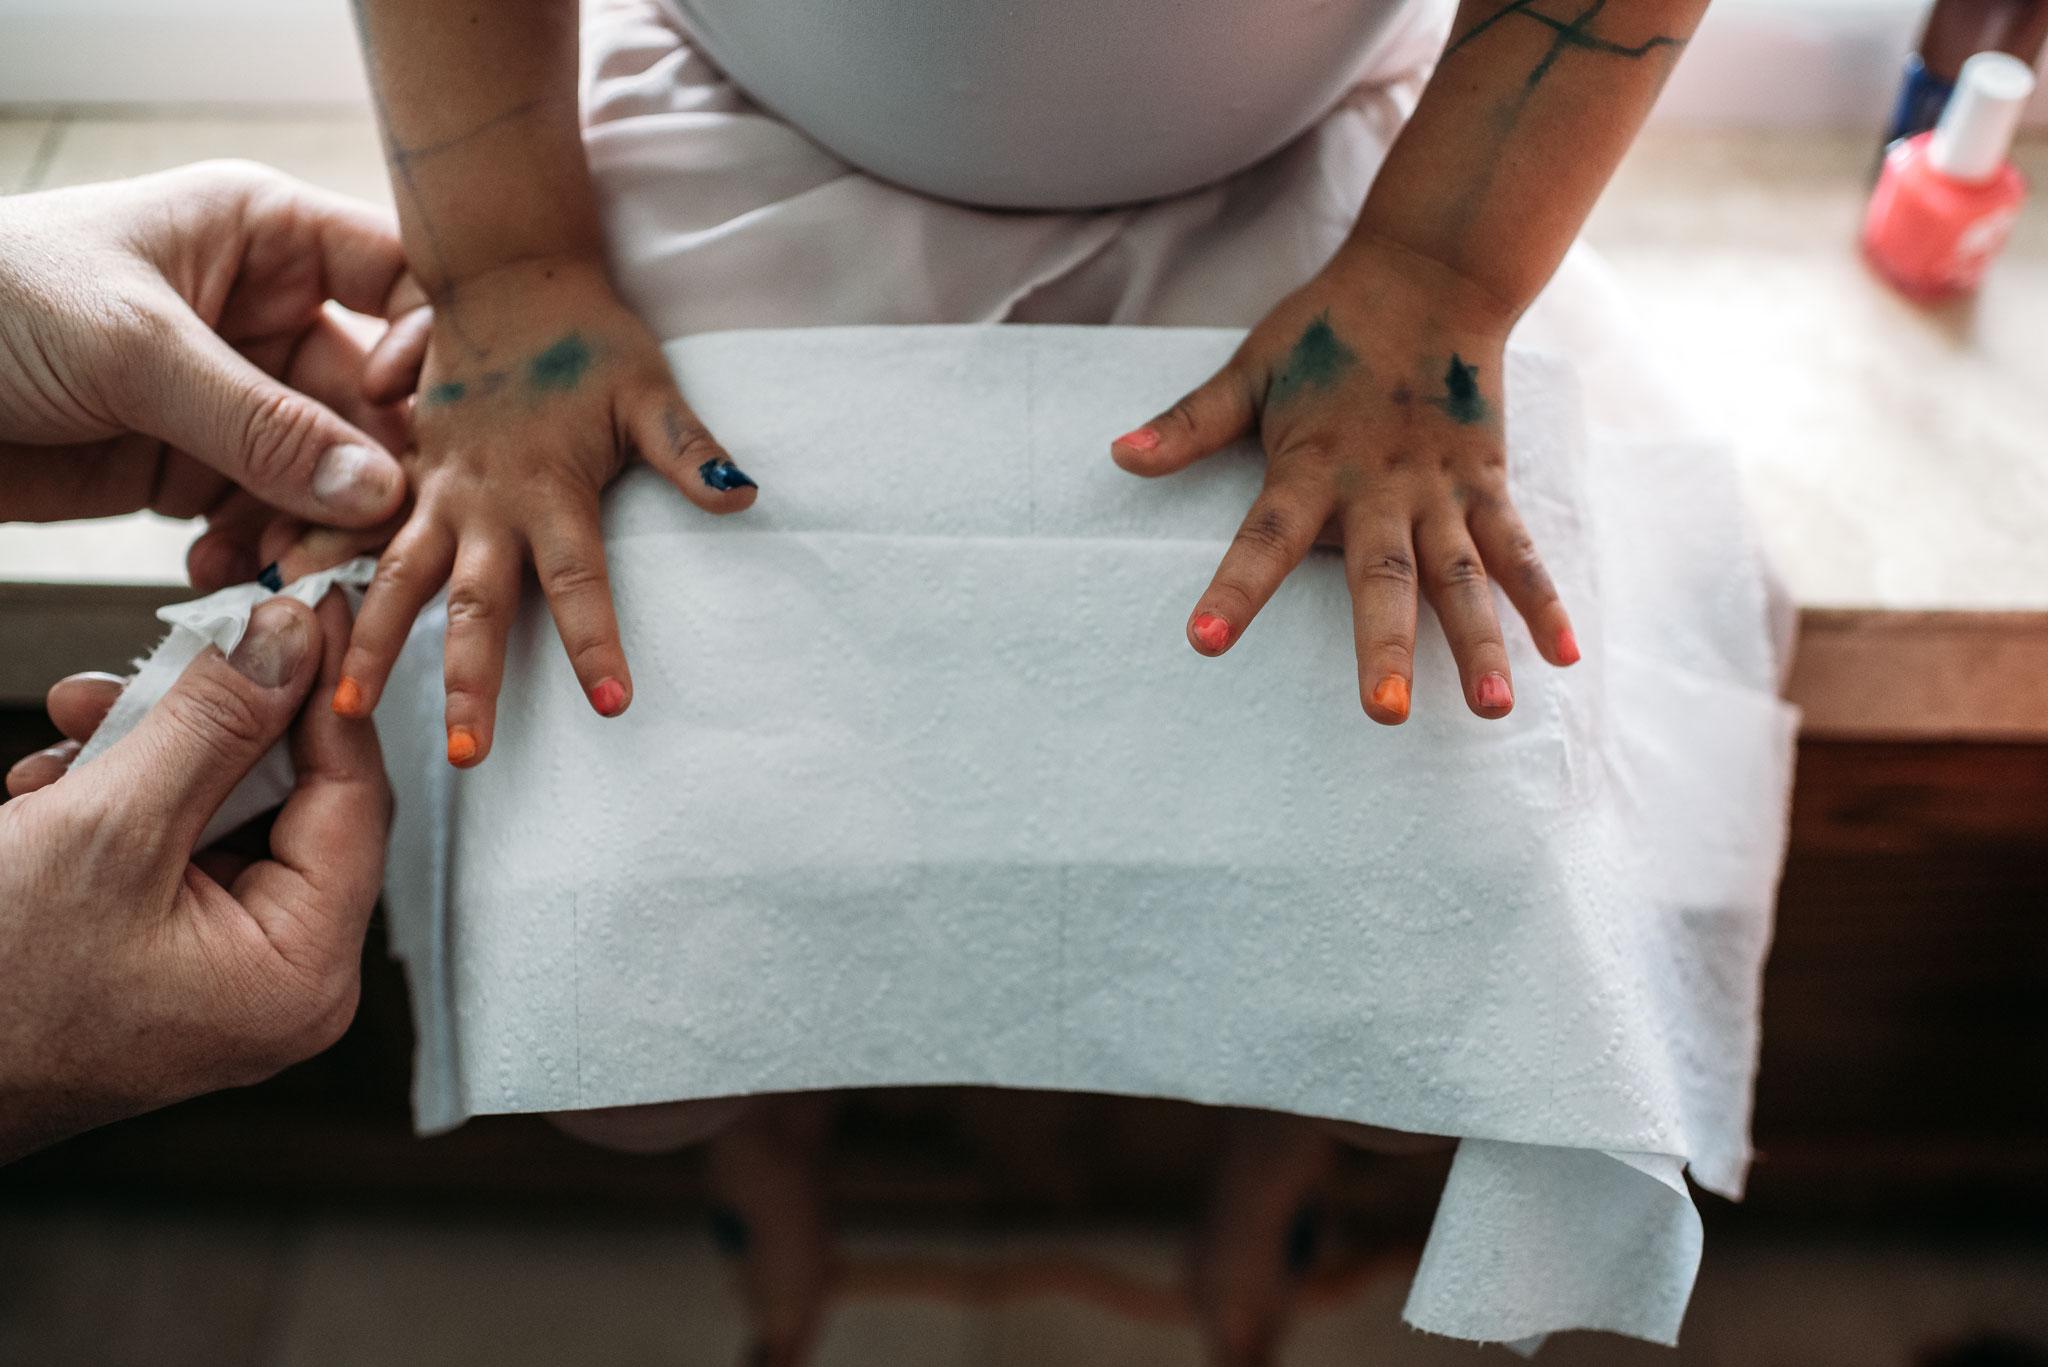 Family Bonding with Nails | Spokane Photographer